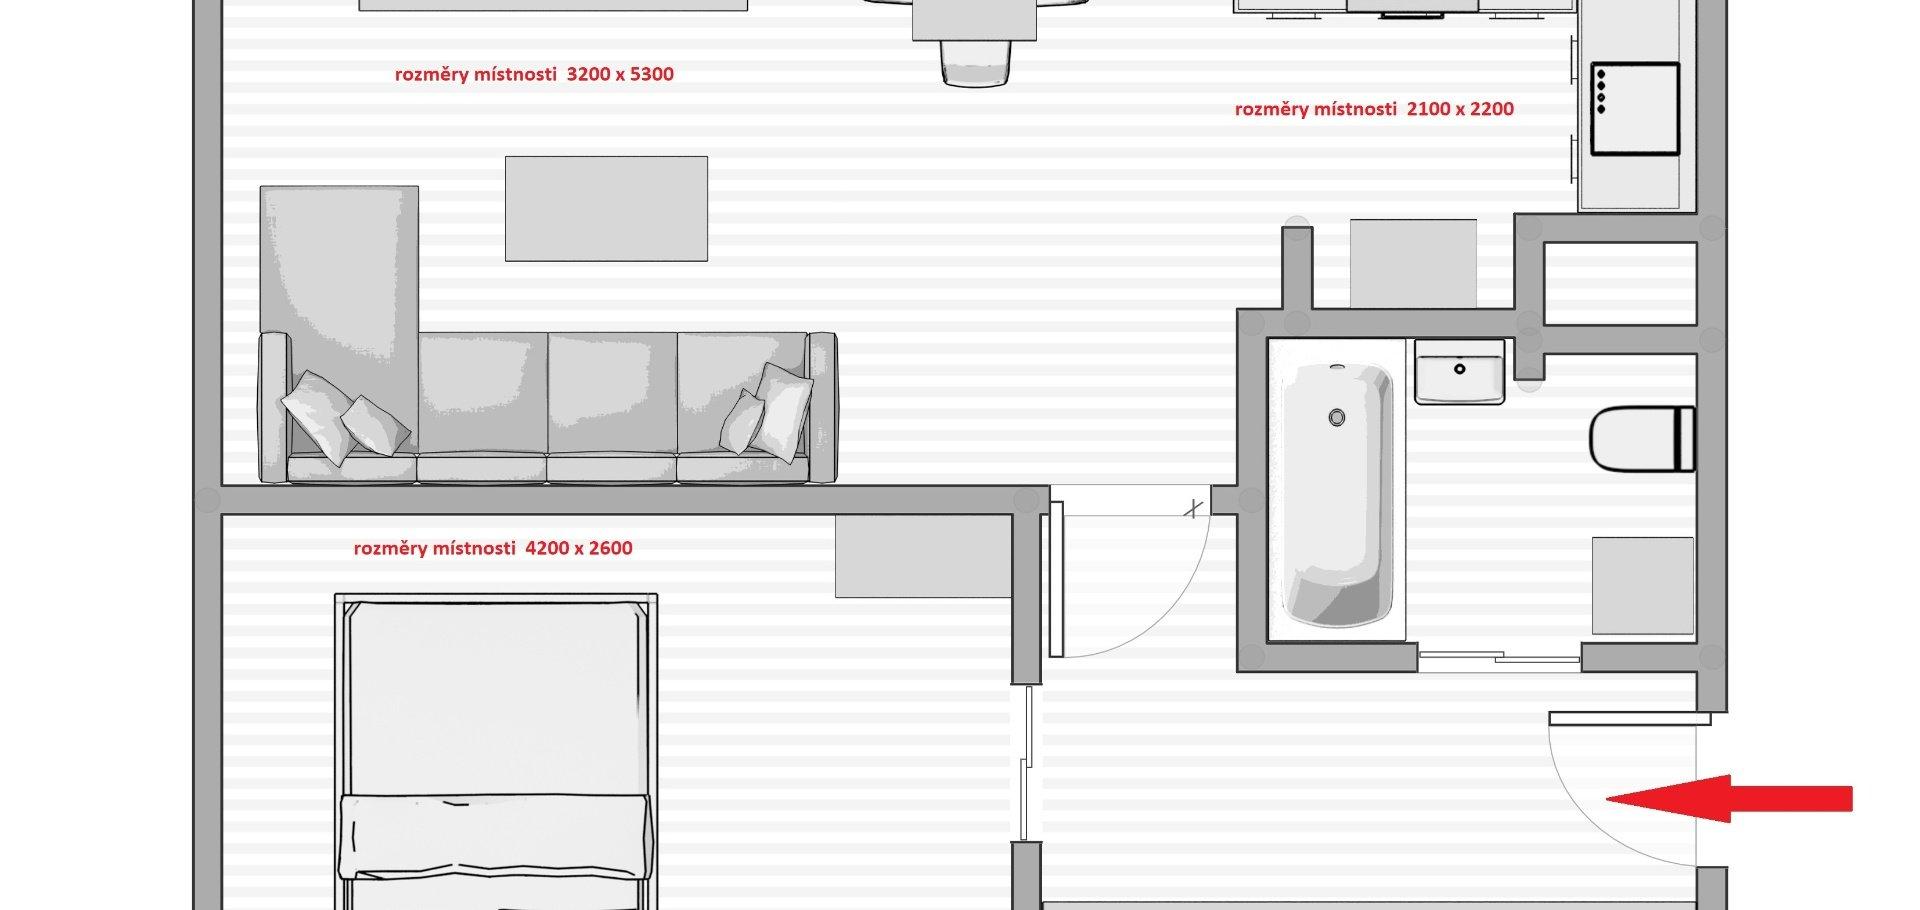 Pronájem bytu 2+kk, 45 m², Vysočanská, Praha - Prosek